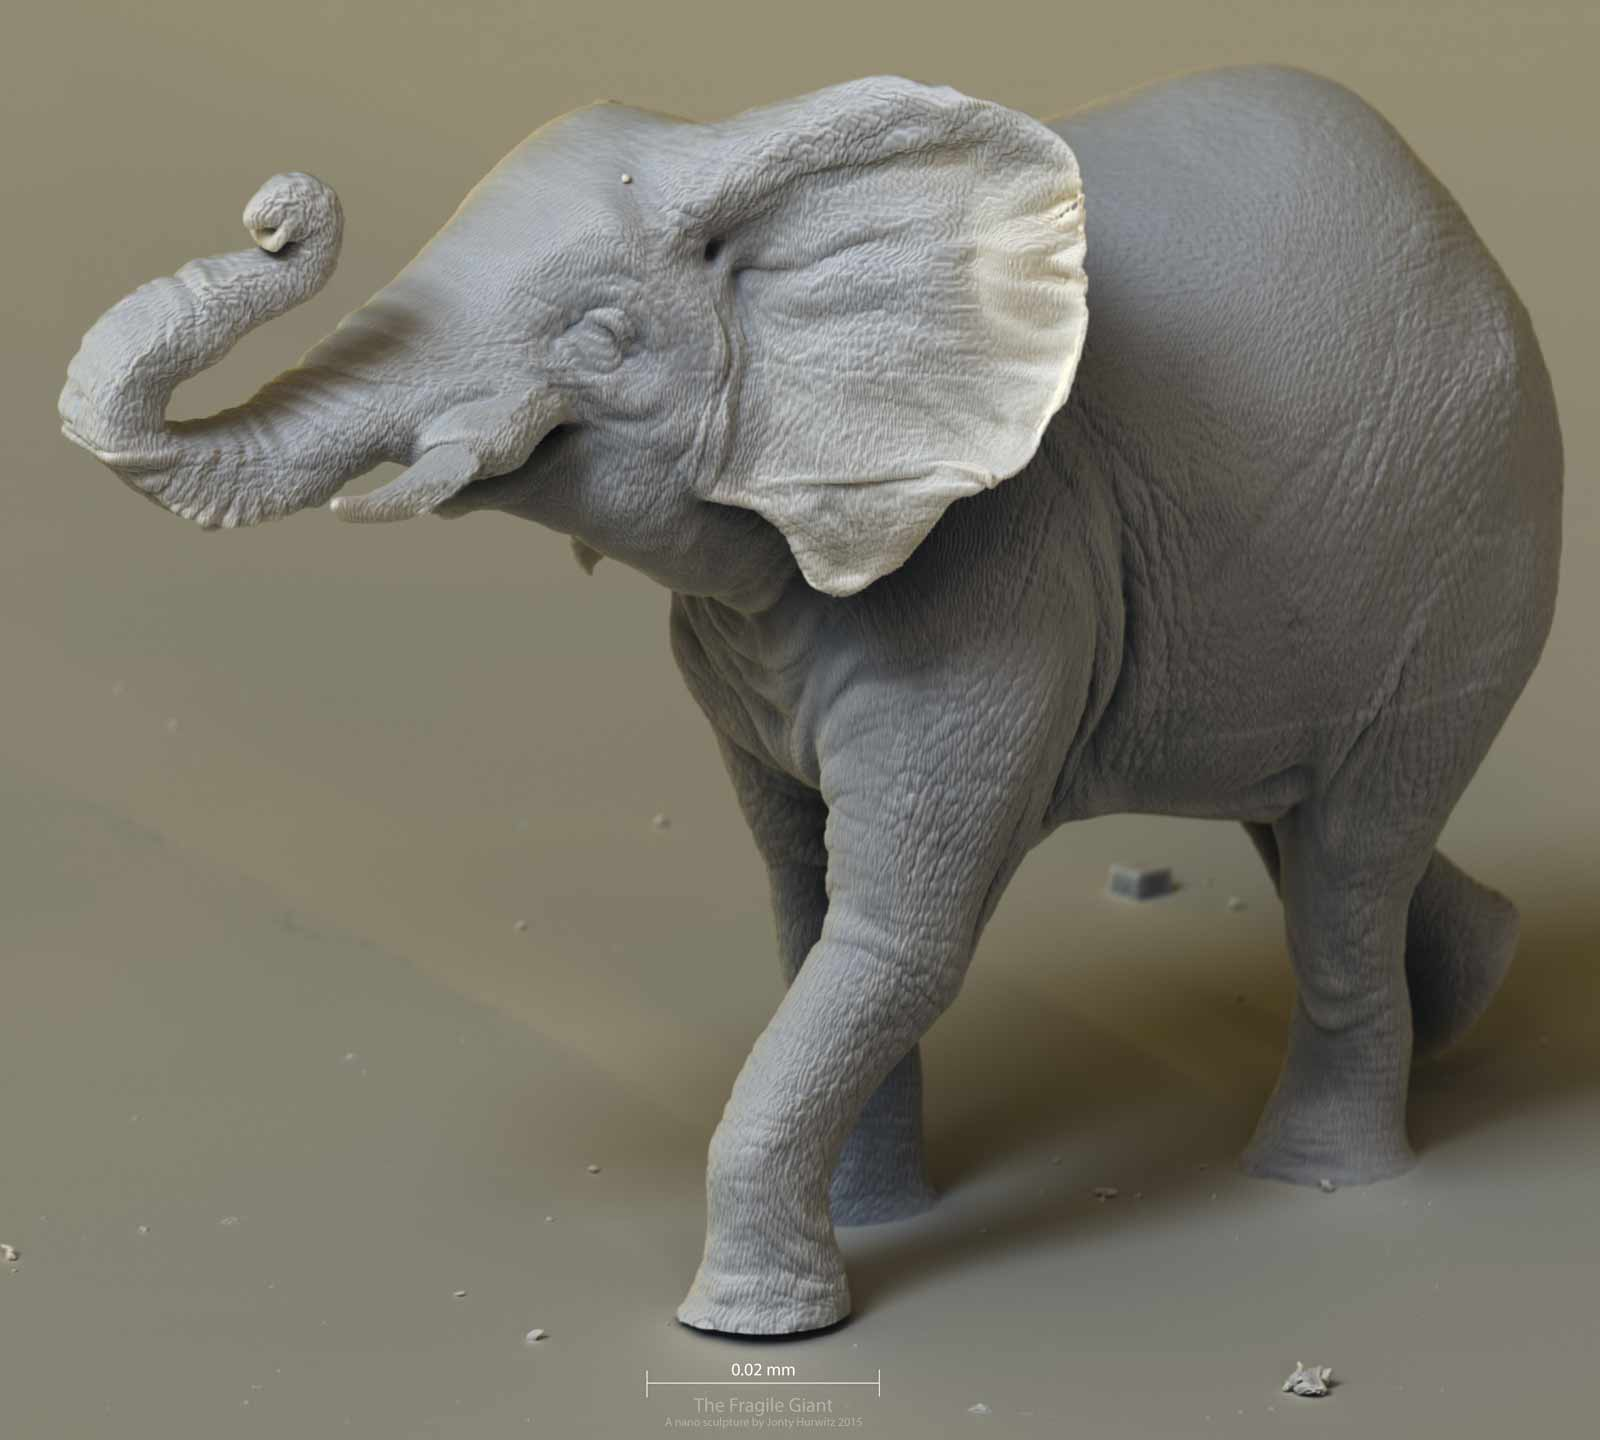 elephant_0206_6k_1.jpg